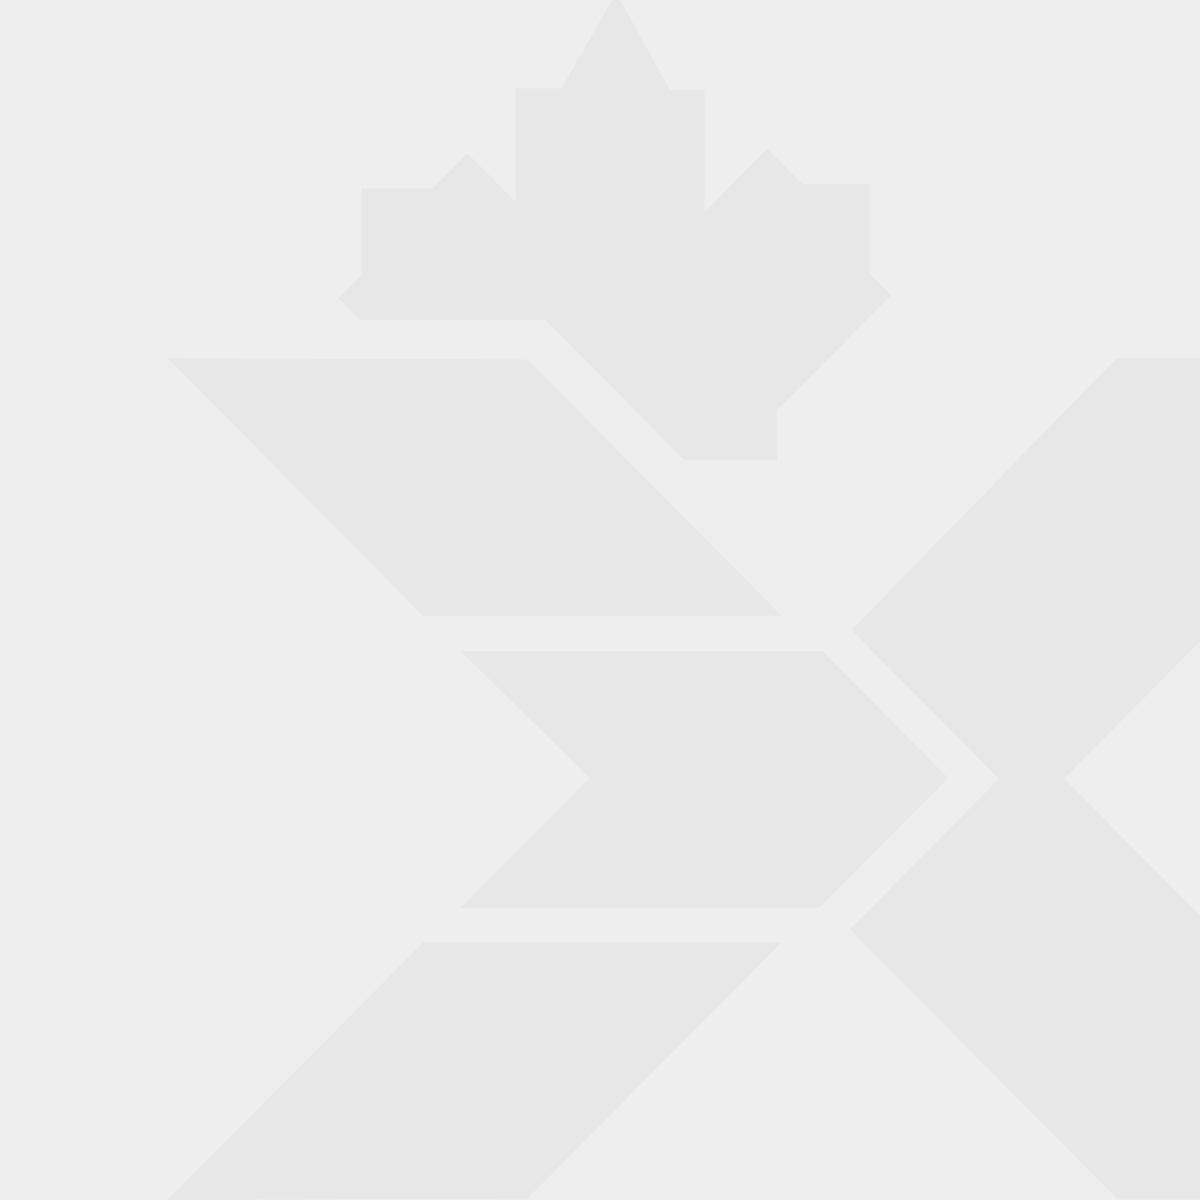 Royal Canadian Navy Women's Tie Bar Naval Ensign